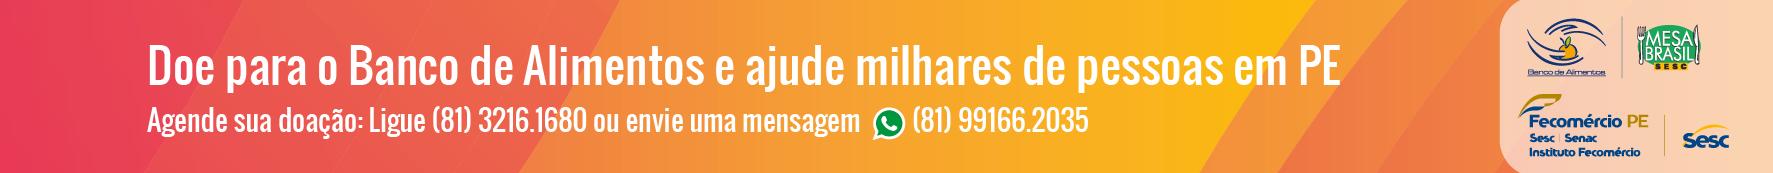 campanha_doacao_banco_loja